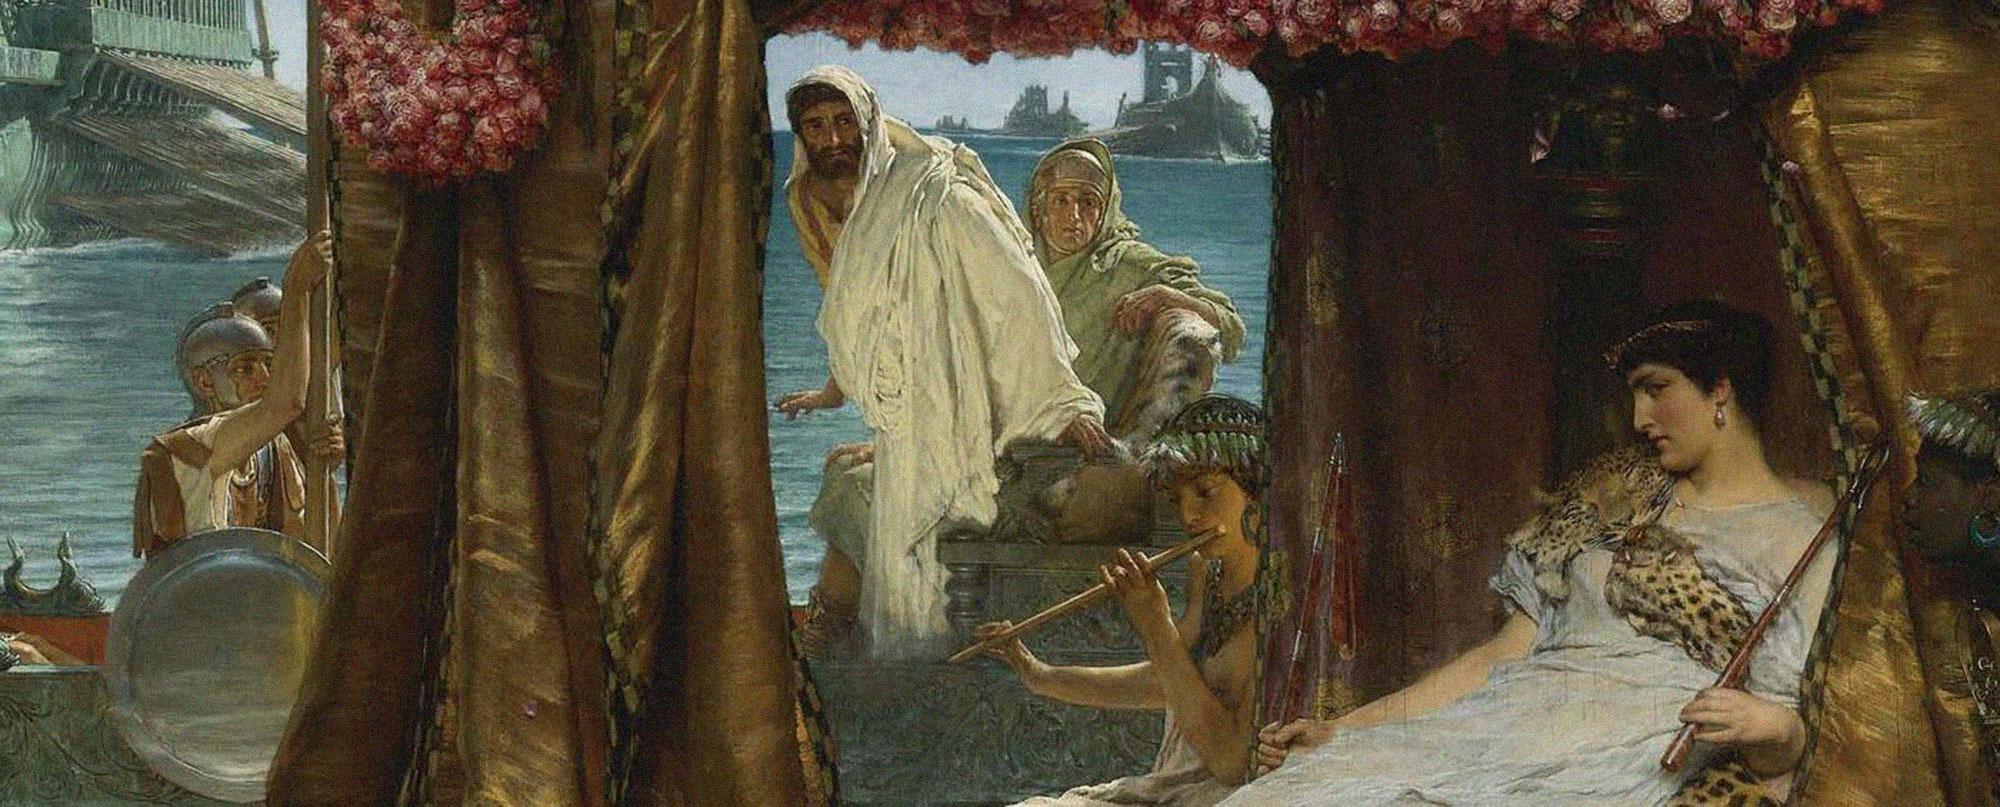 Sir_Lawrence_Alma-Tadema_-_The_Meeting_of_Antony_and_Cleopatra